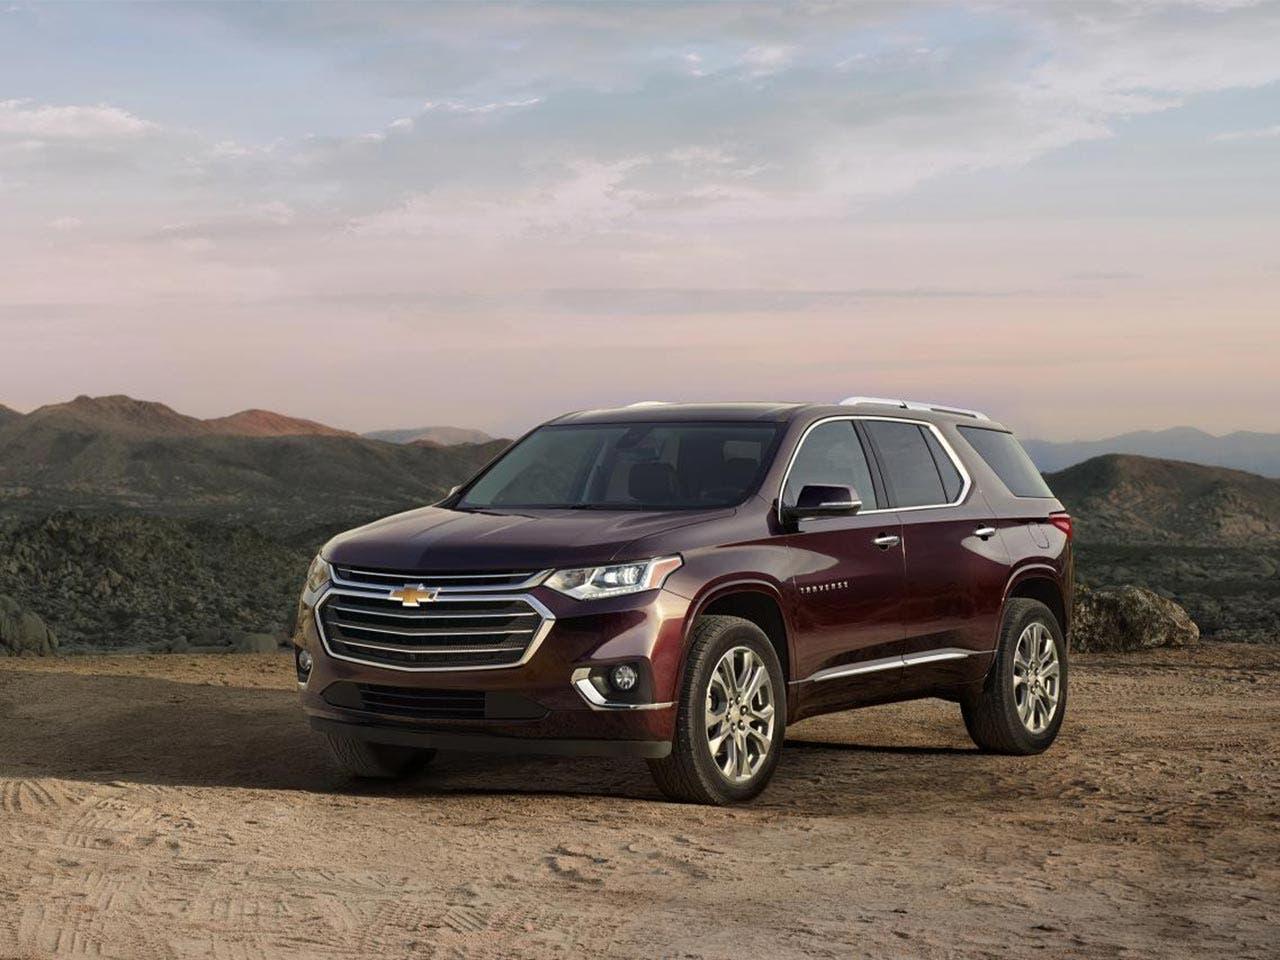 2018 Chevrolet Traverse © General Motors